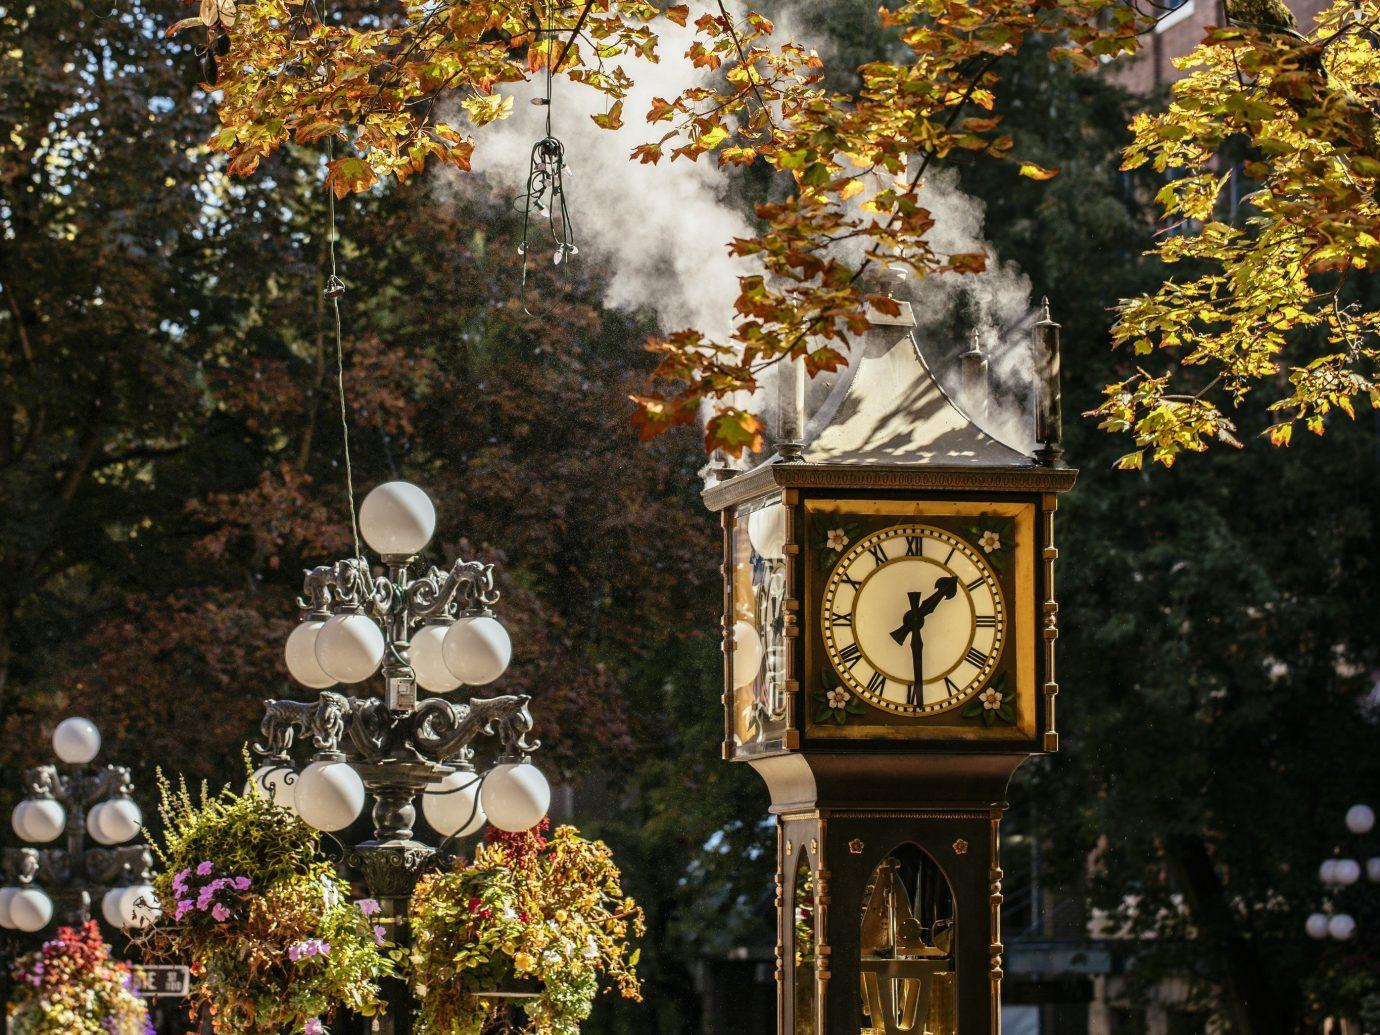 Trip Ideas clock tree outdoor season autumn leaf flower spring shrine surrounded